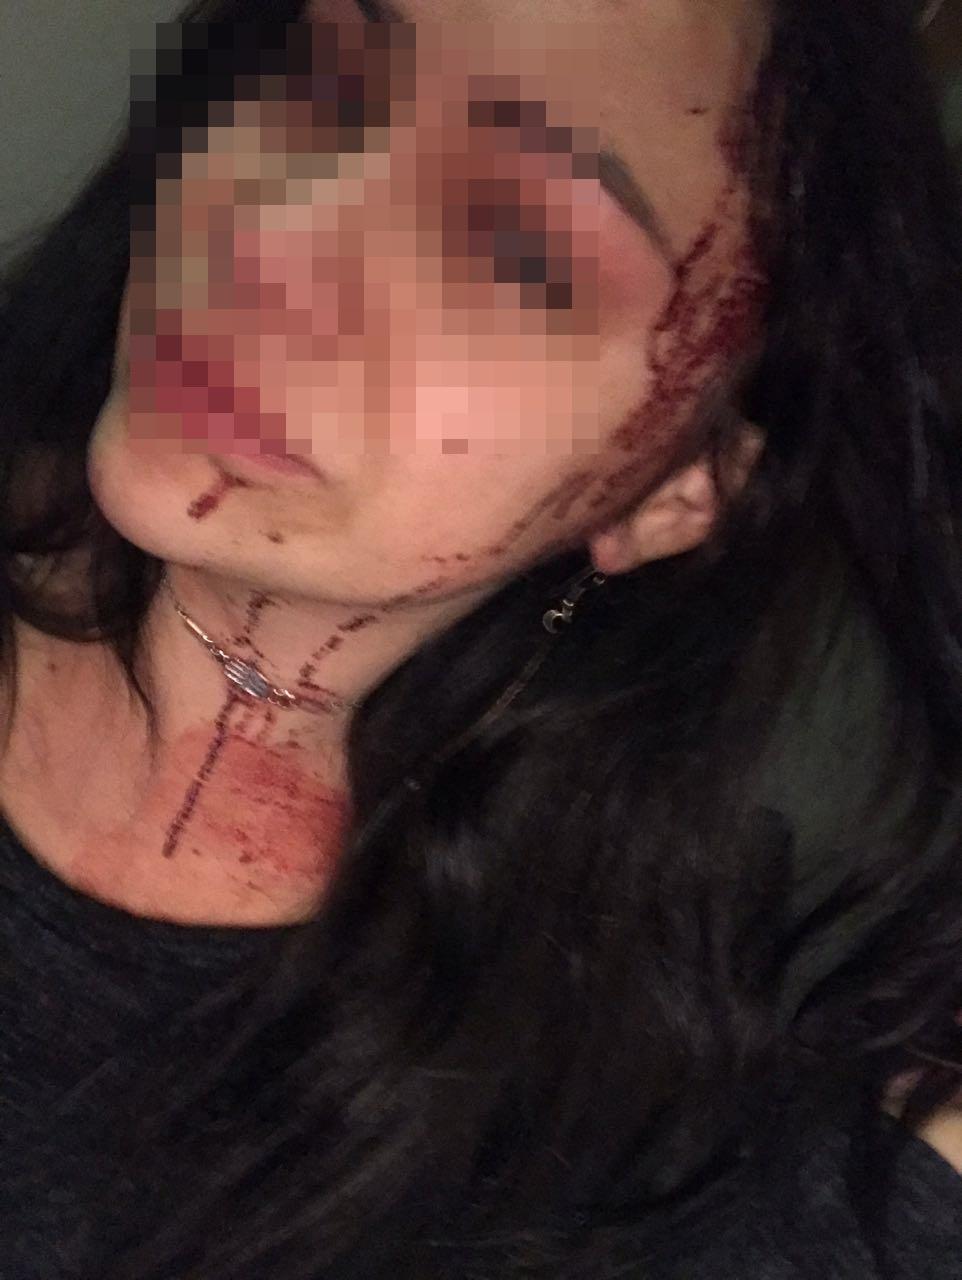 foto-de-mujer-agredida